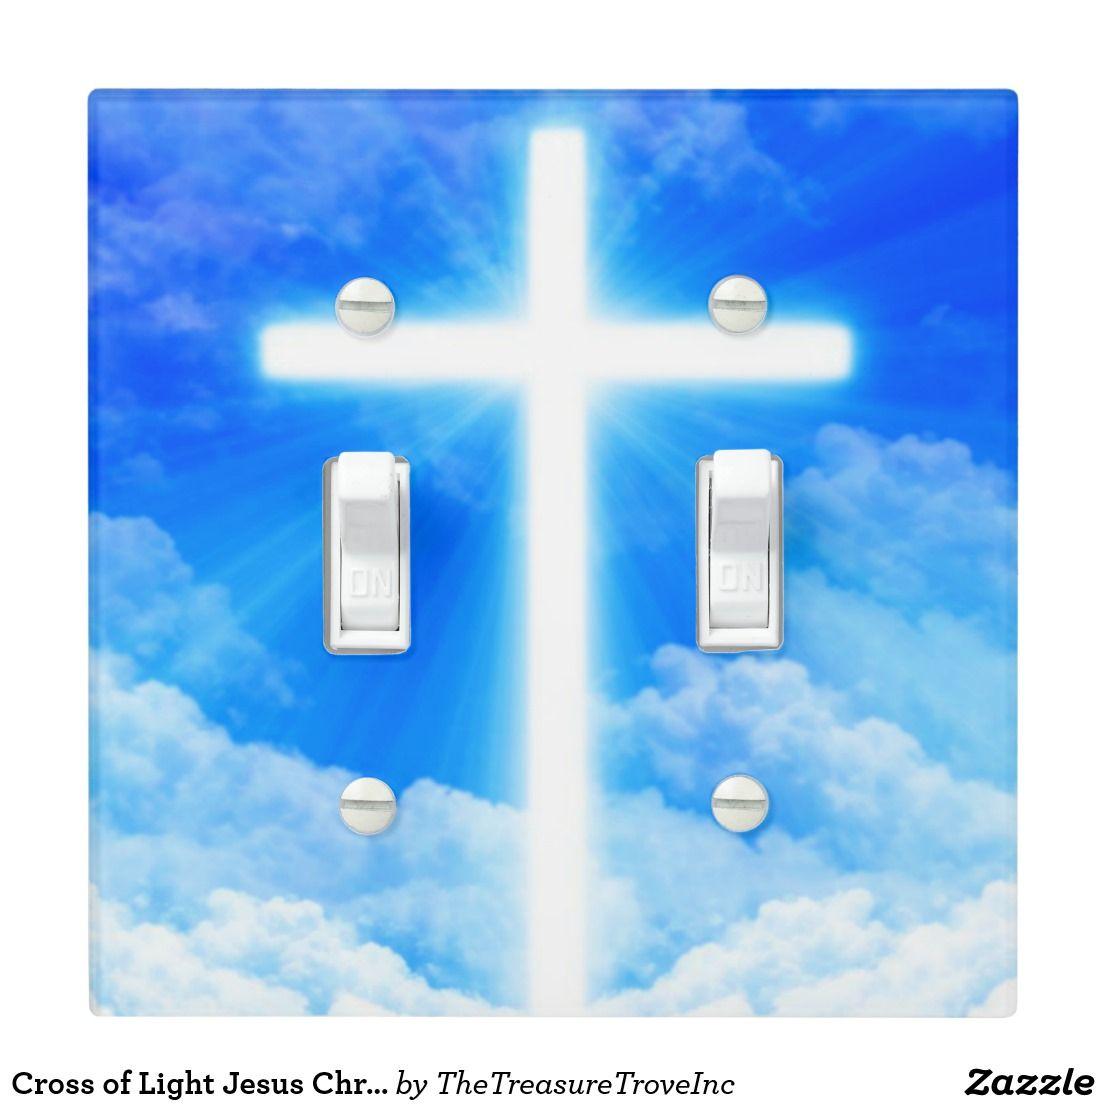 Cross Of Light Jesus Christ Customizable Christian Light Switch Cover Zazzle Com Christian Messages The Cross Of Christ Jesus Christ